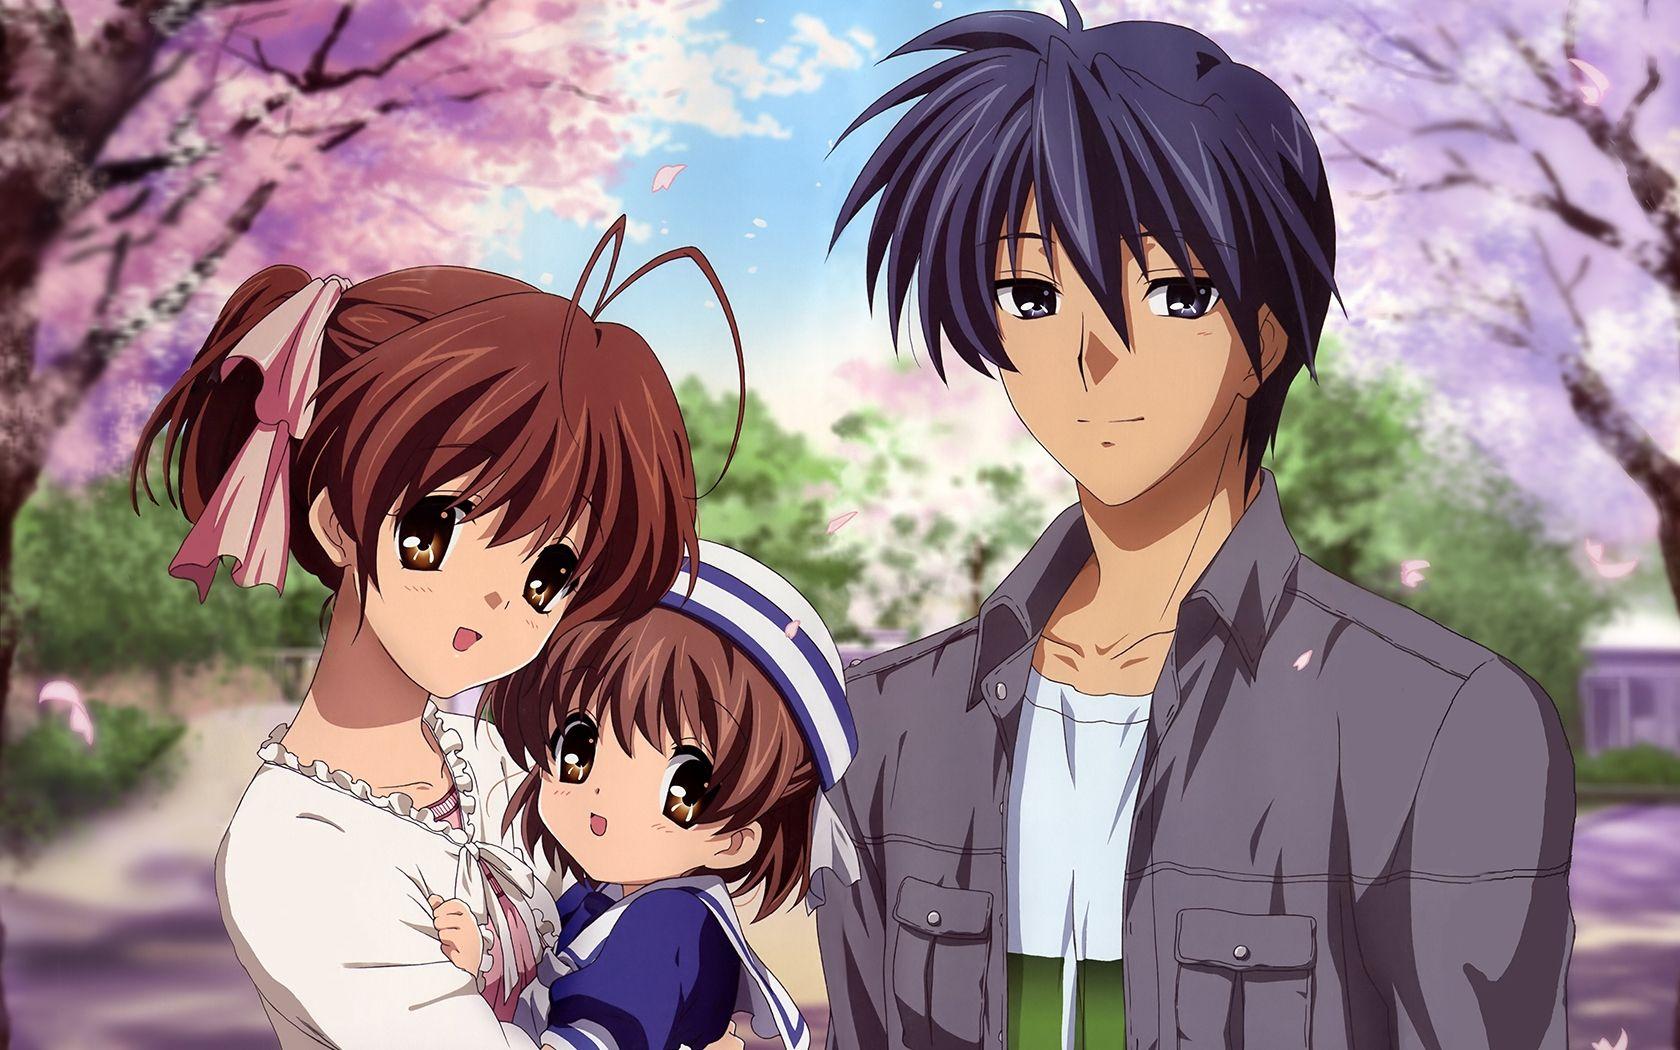 Nagisa Ushio And Tomoya Tomoya And Nagisa 35864817 1680 1050 Jpg